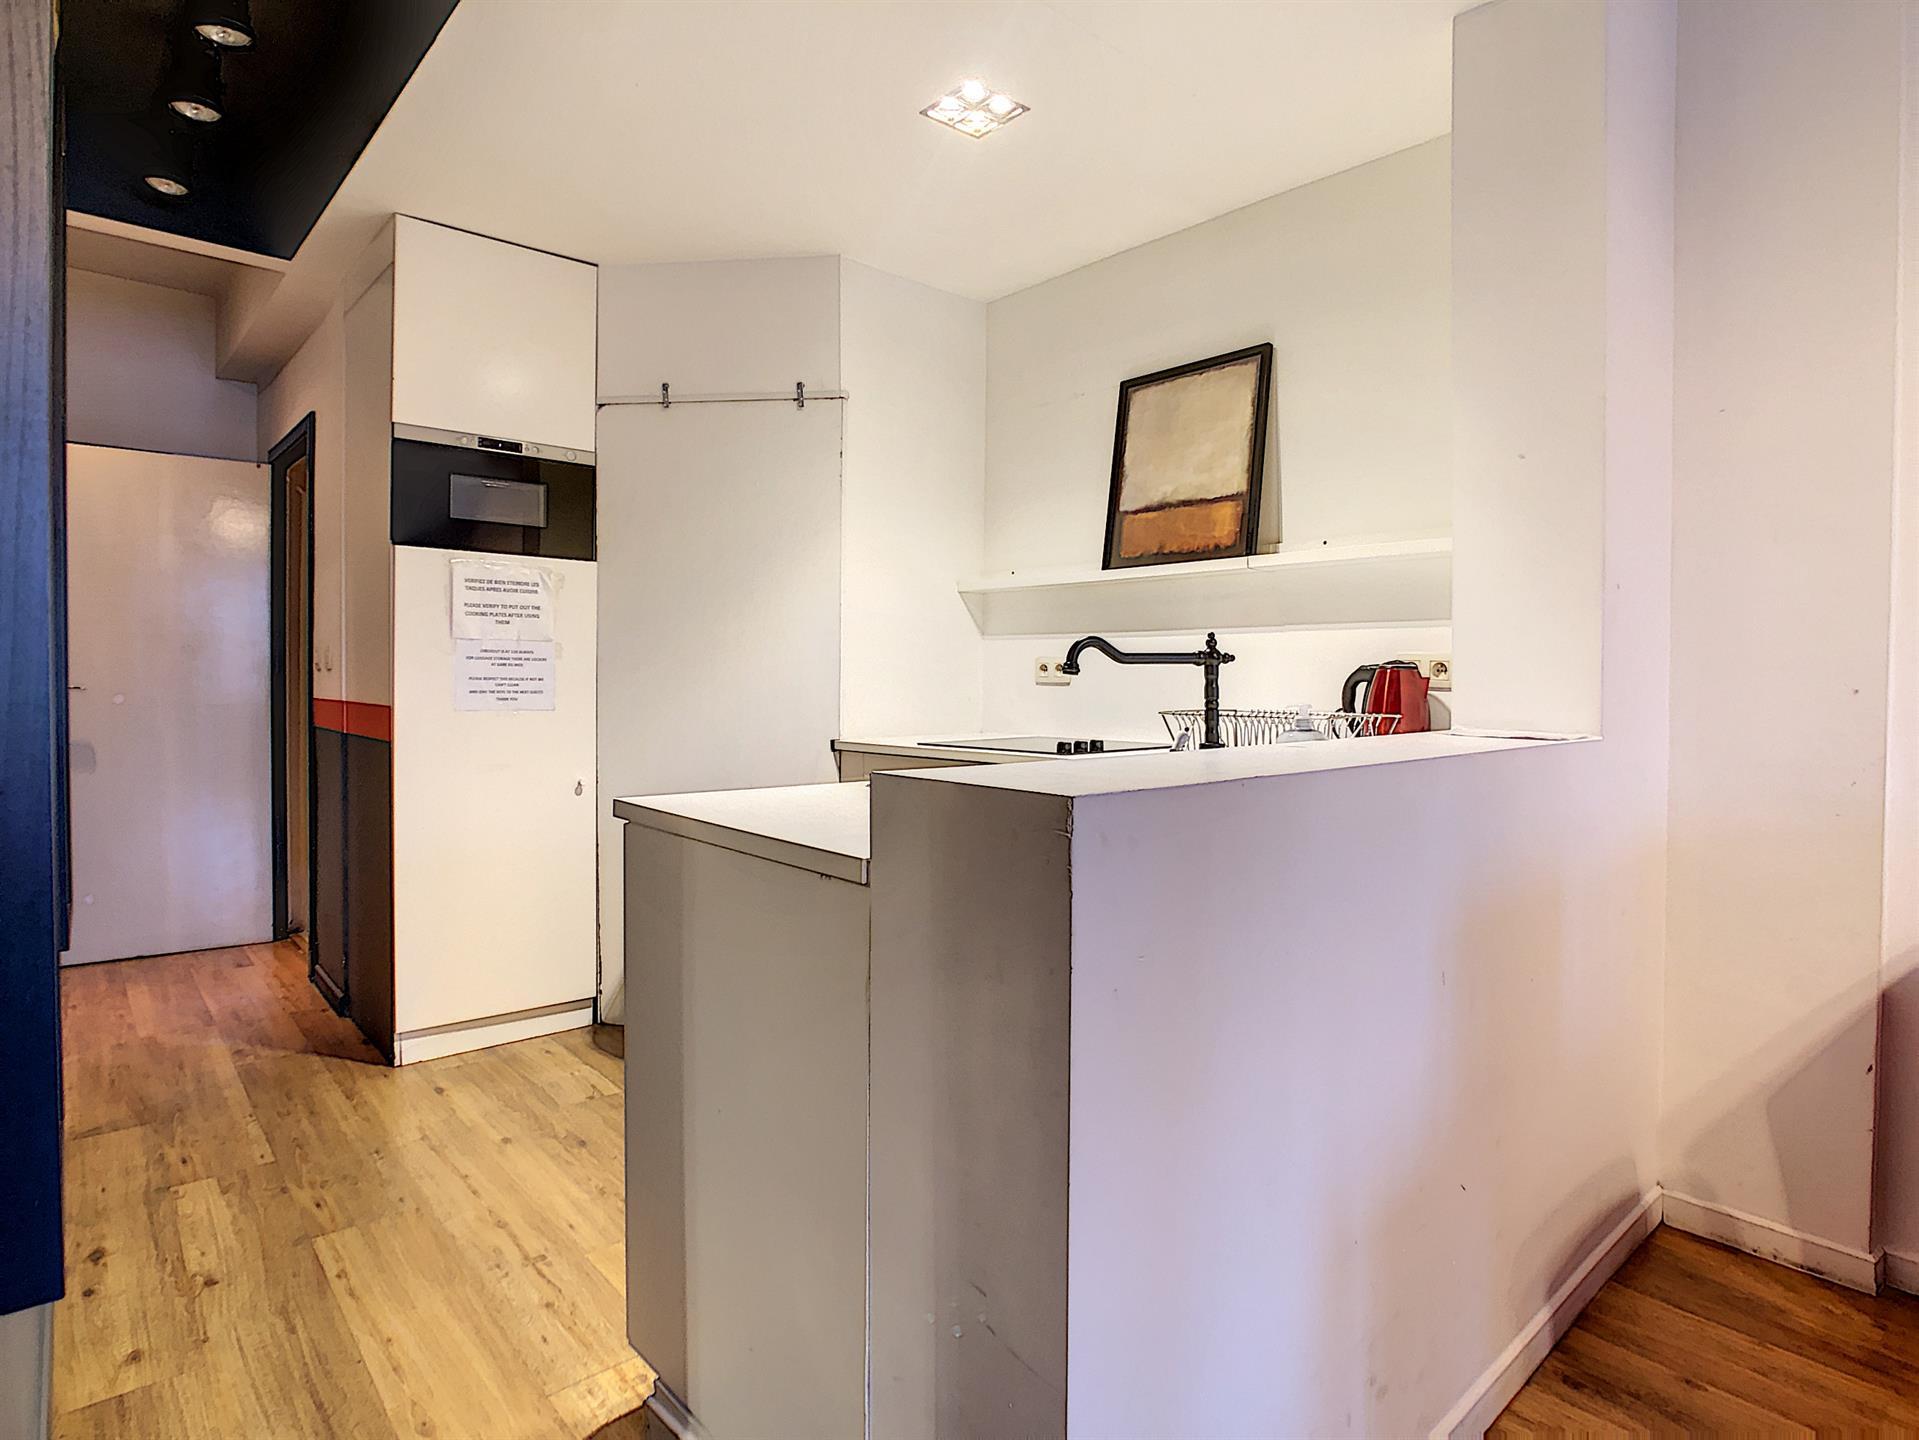 Appartement - Sint-Gillis - #4236948-5